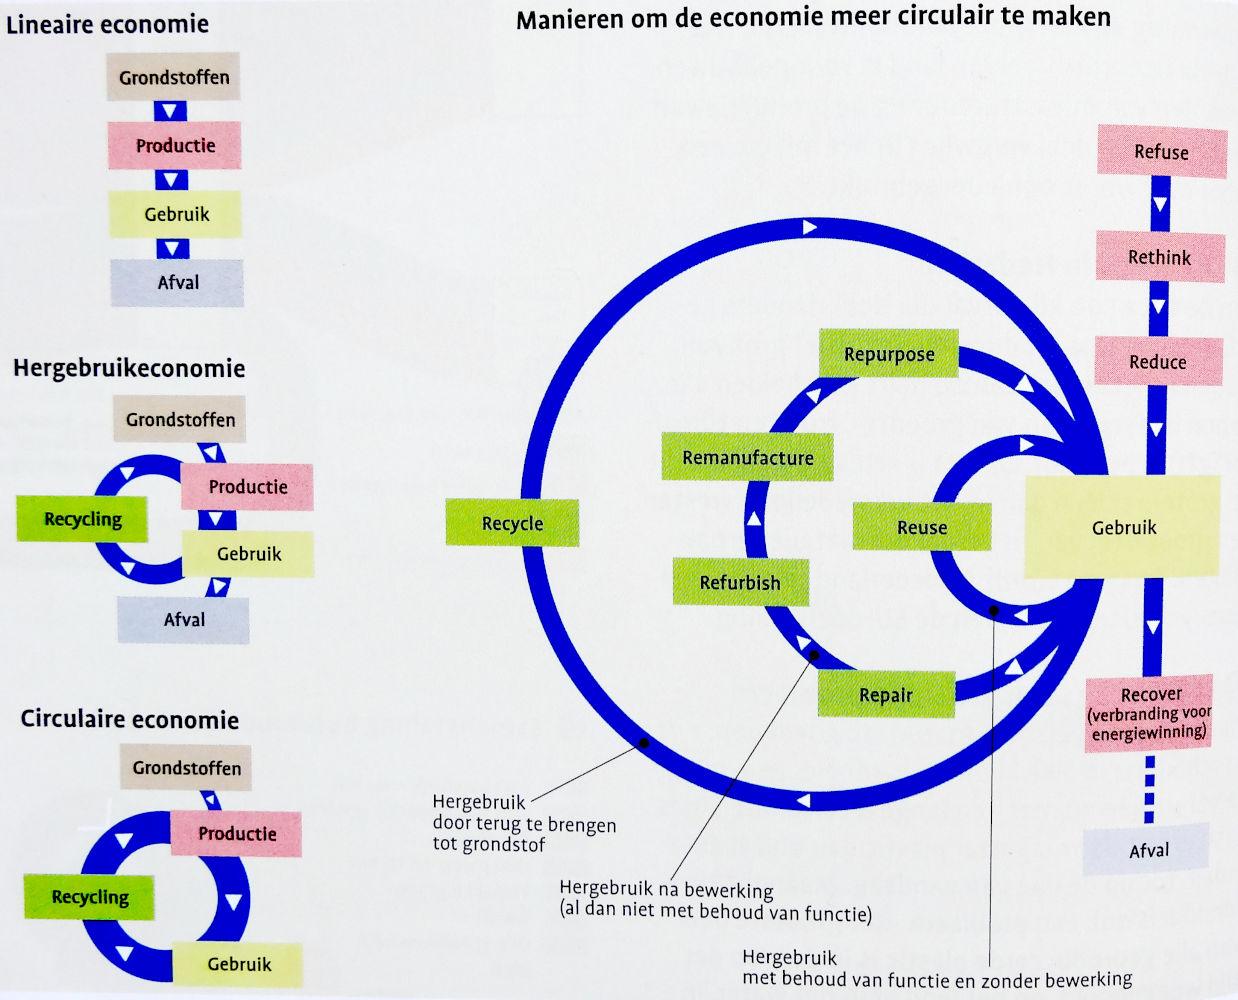 Bladzijde 54: Circulaire economie